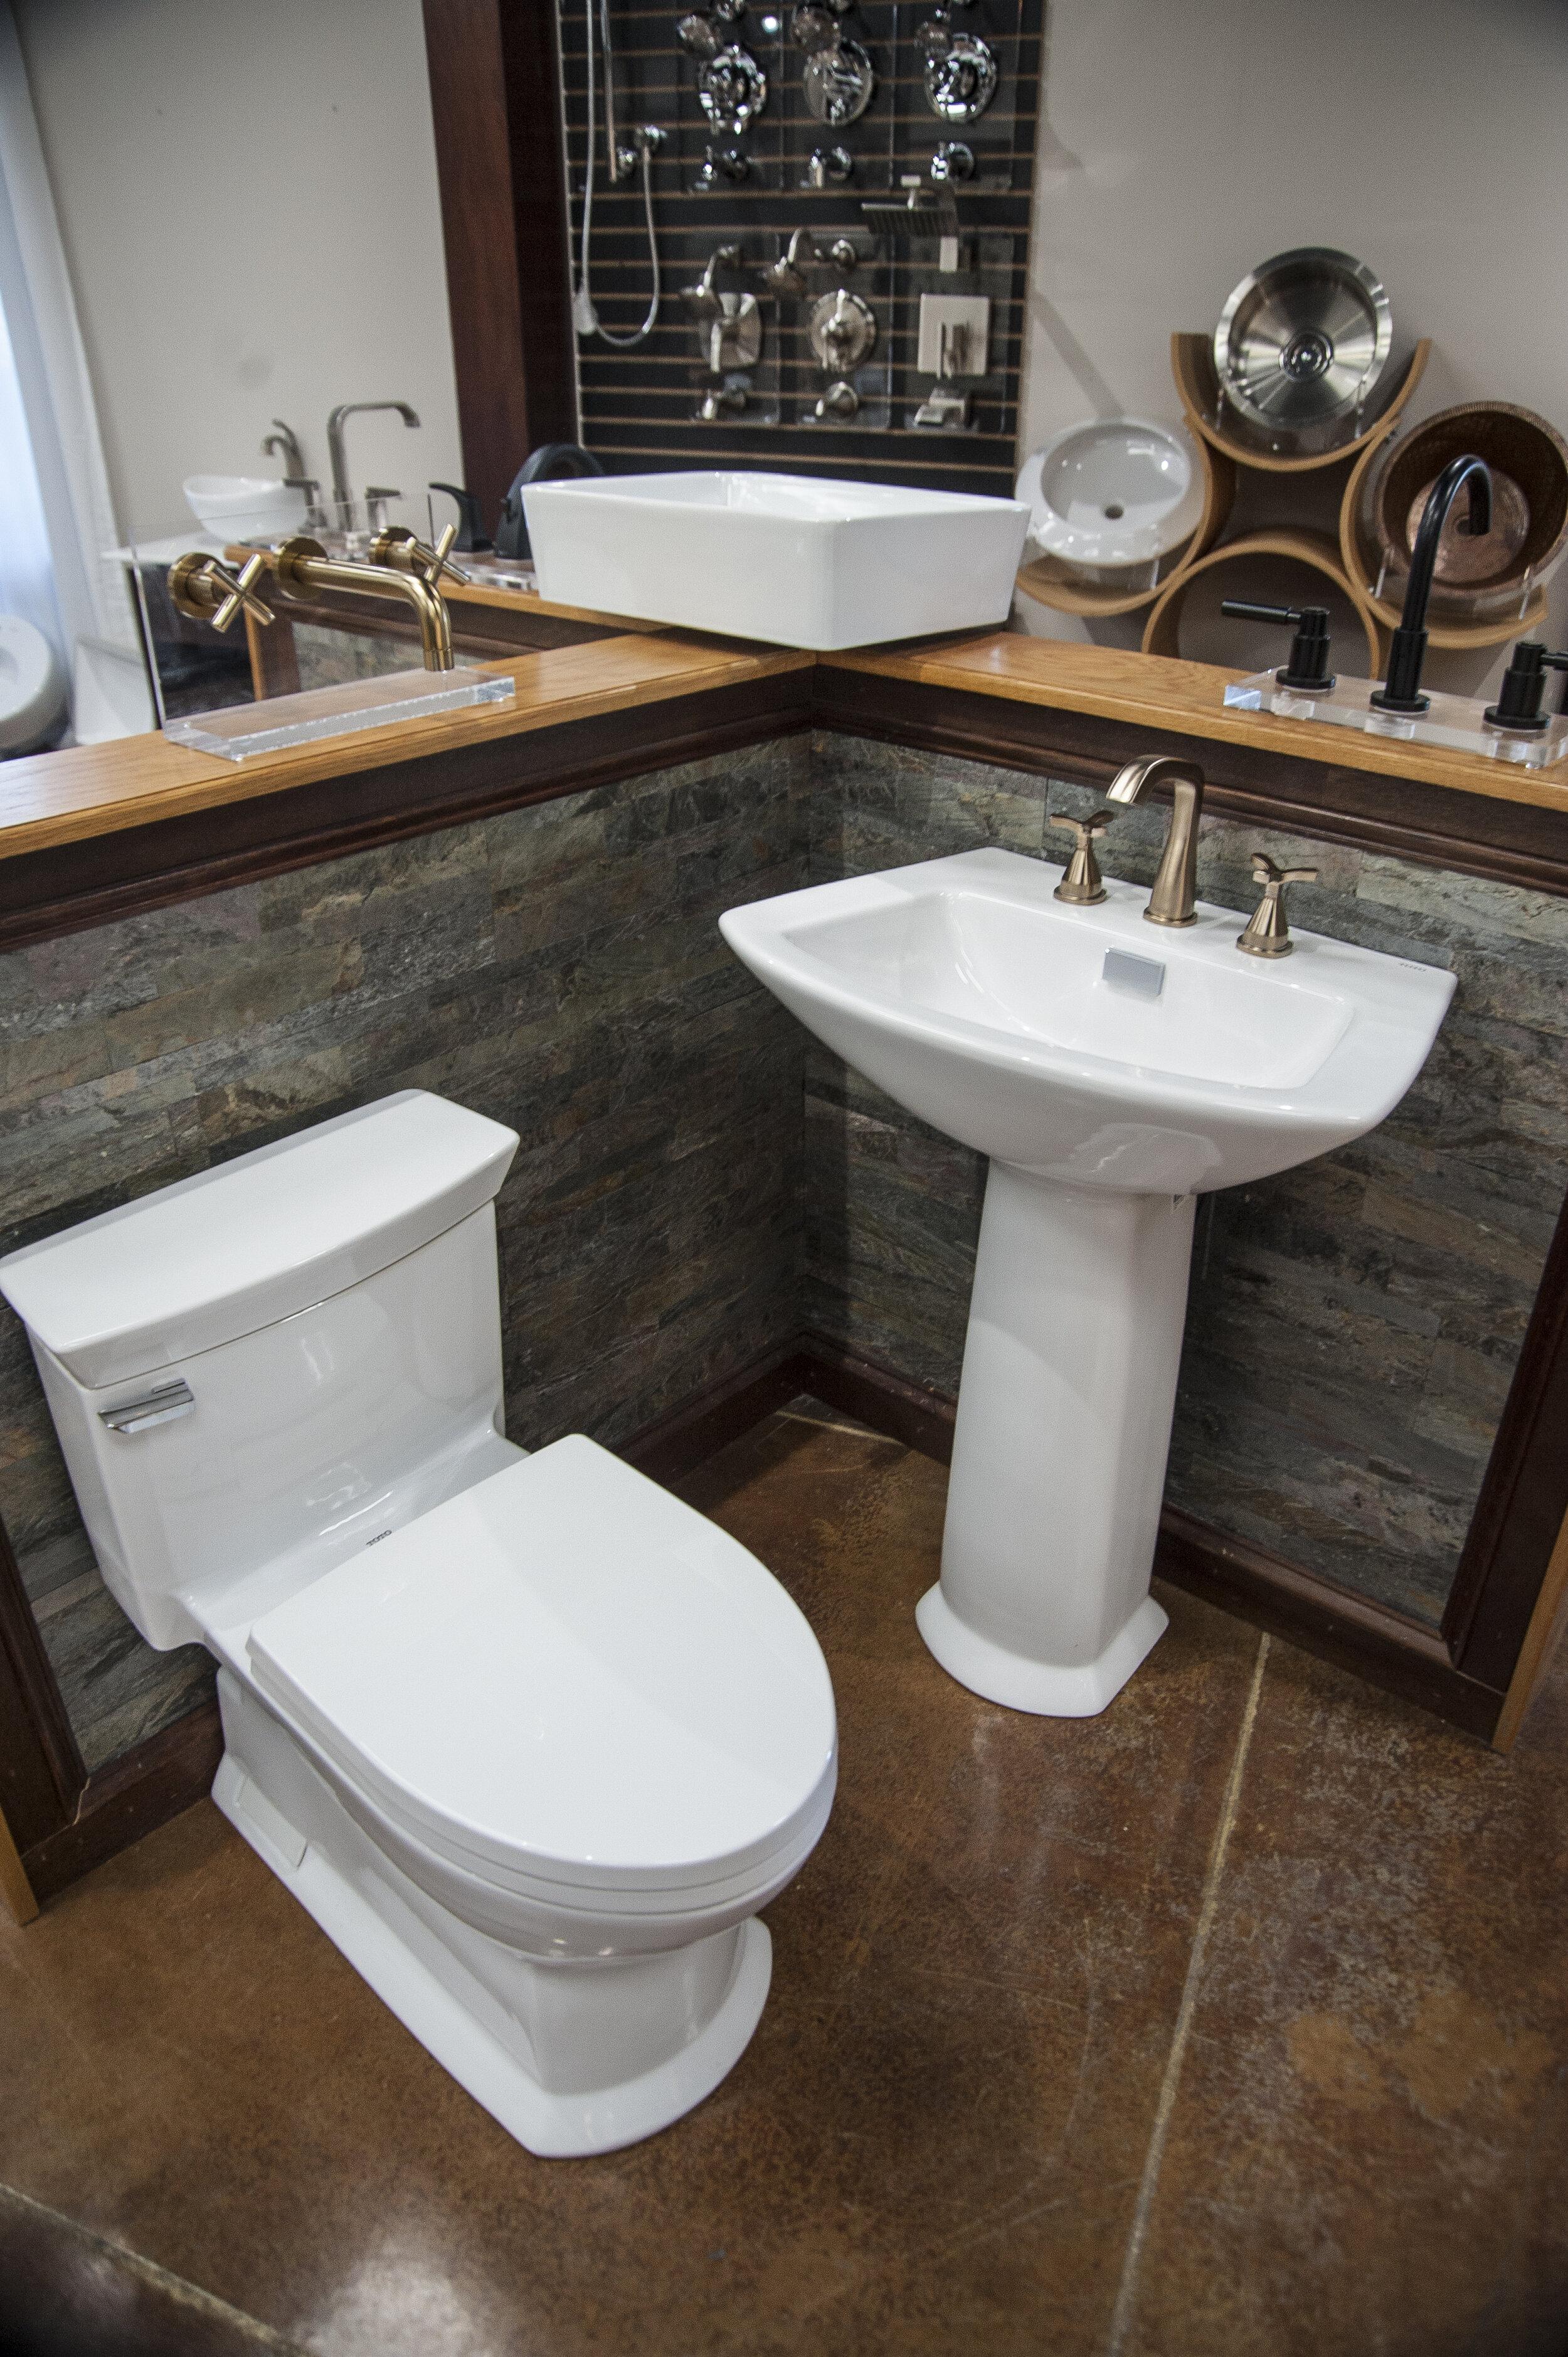 Toilets, Bidets & Washlets in Birmingham, AL — GLS Supply